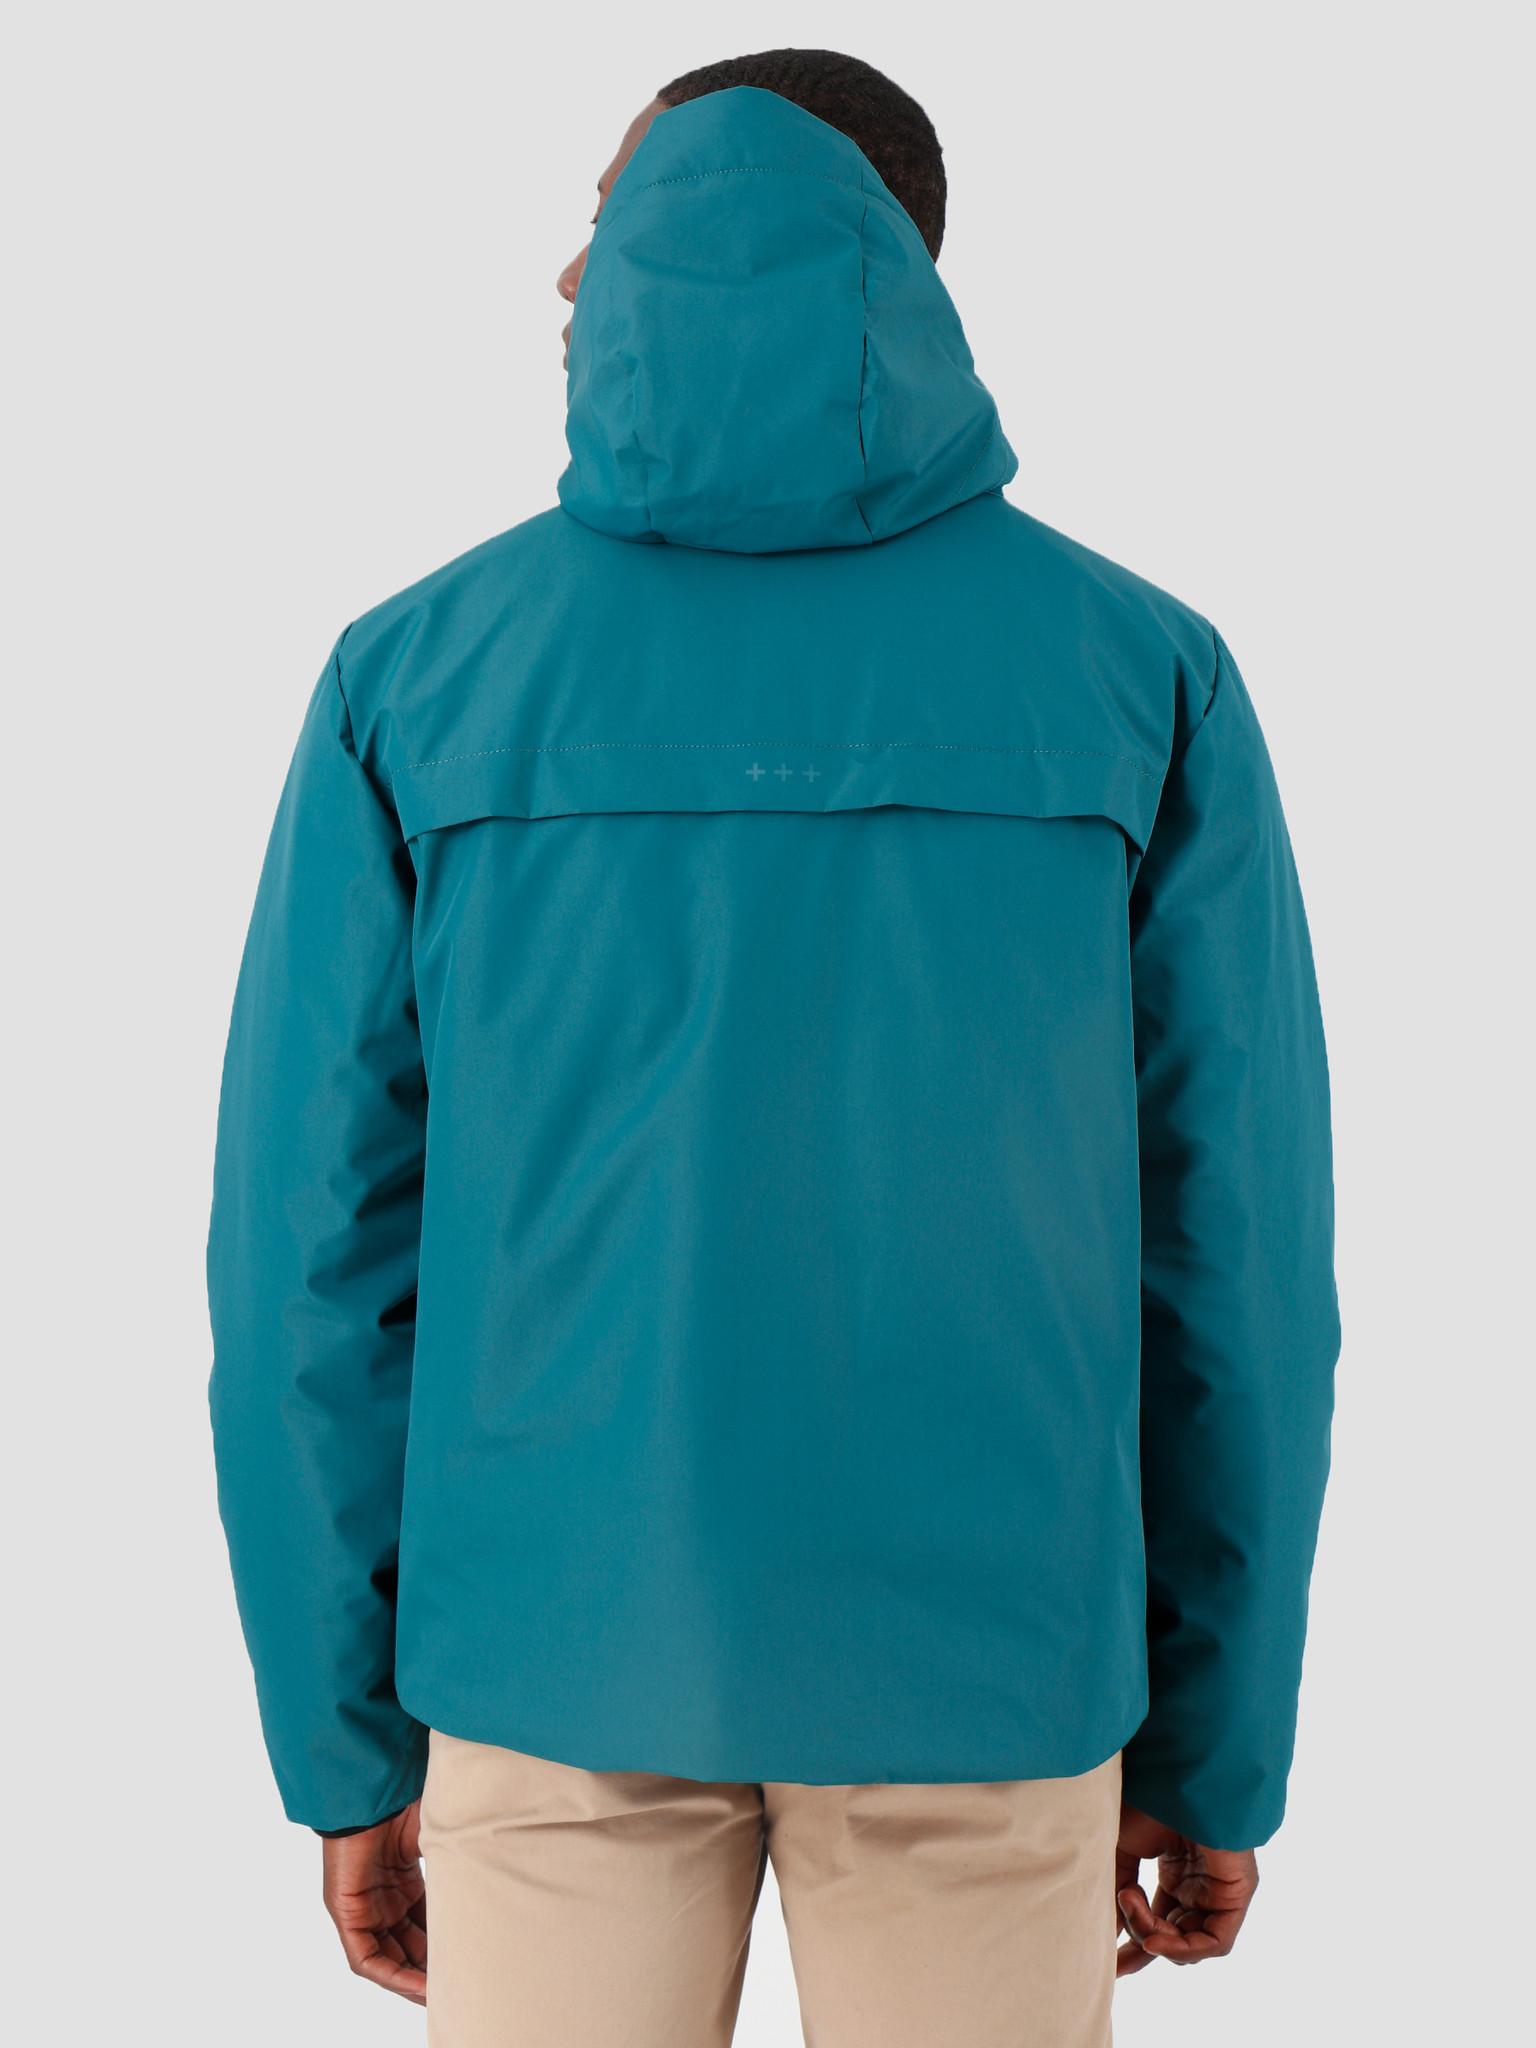 Quality Blanks Quality Blanks QB24 Short Jacket Dark Teal